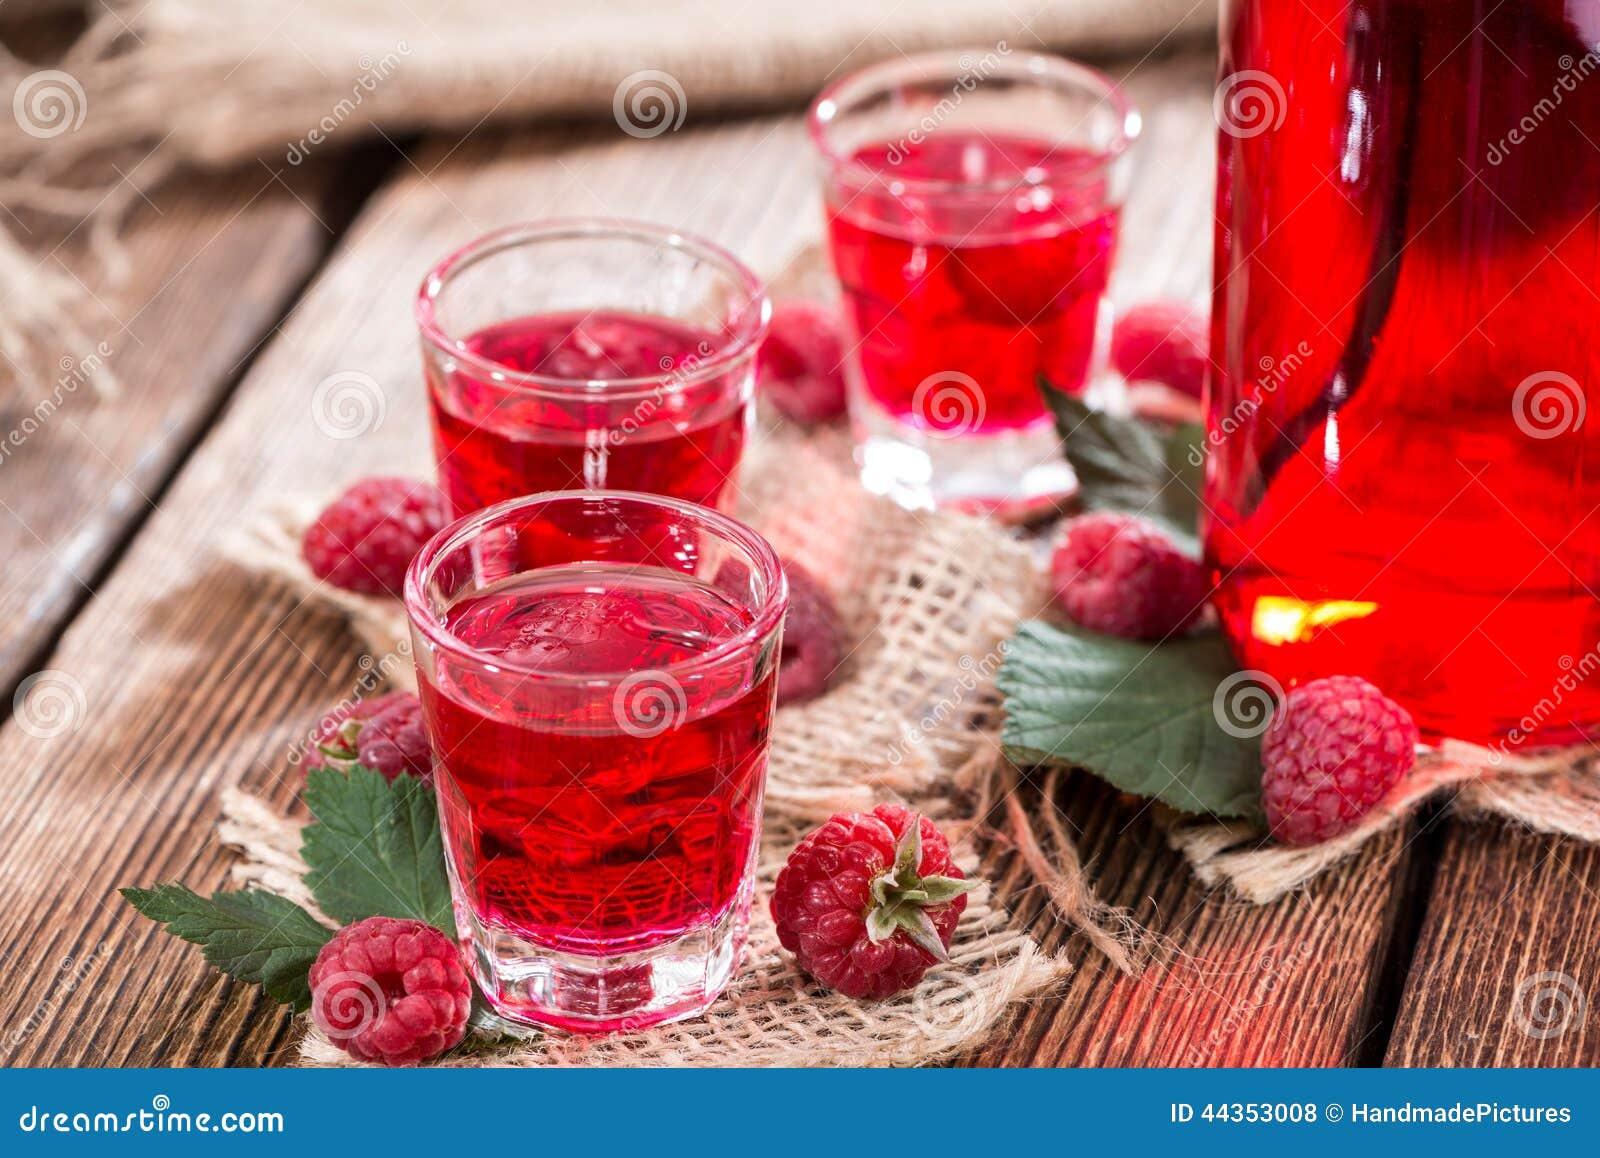 Liquore casalingo del lampone